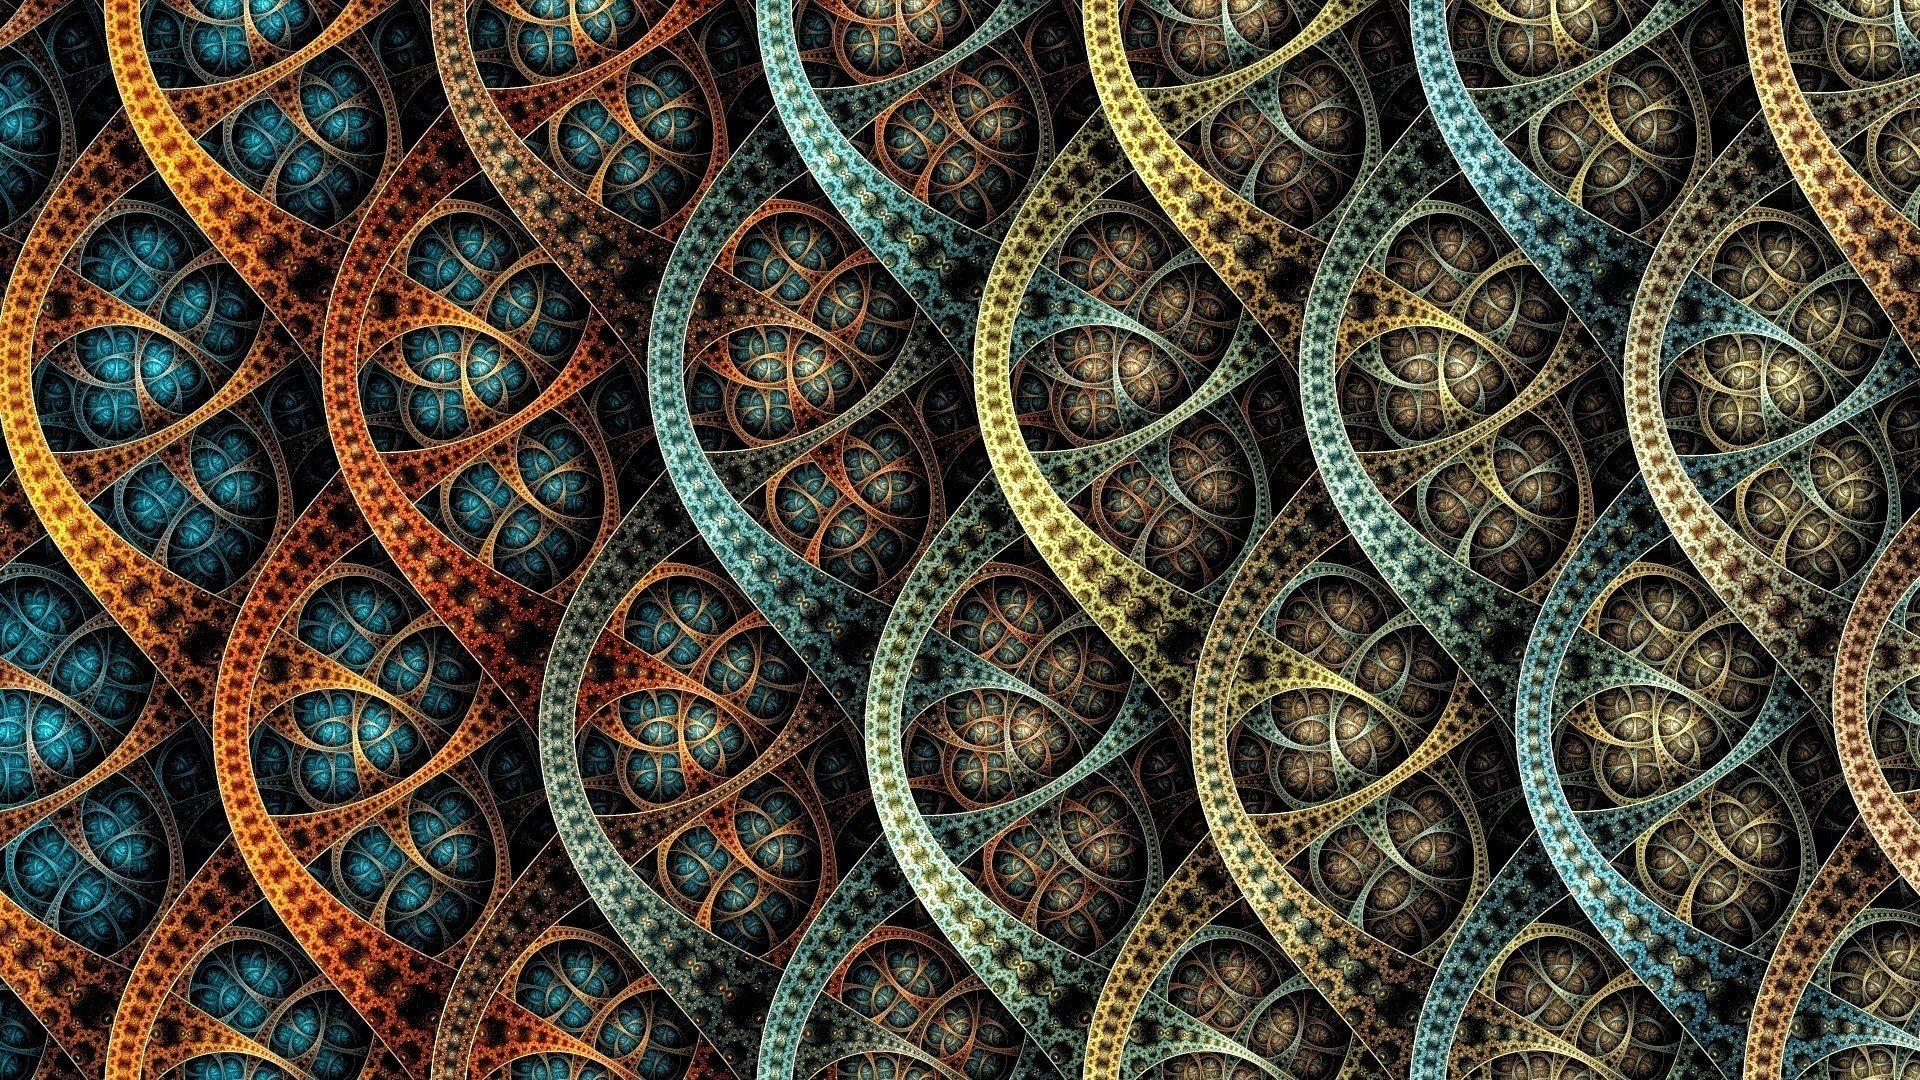 Mermaid scales wallpapers wallpapertag - Hd pattern wallpapers 1080p ...